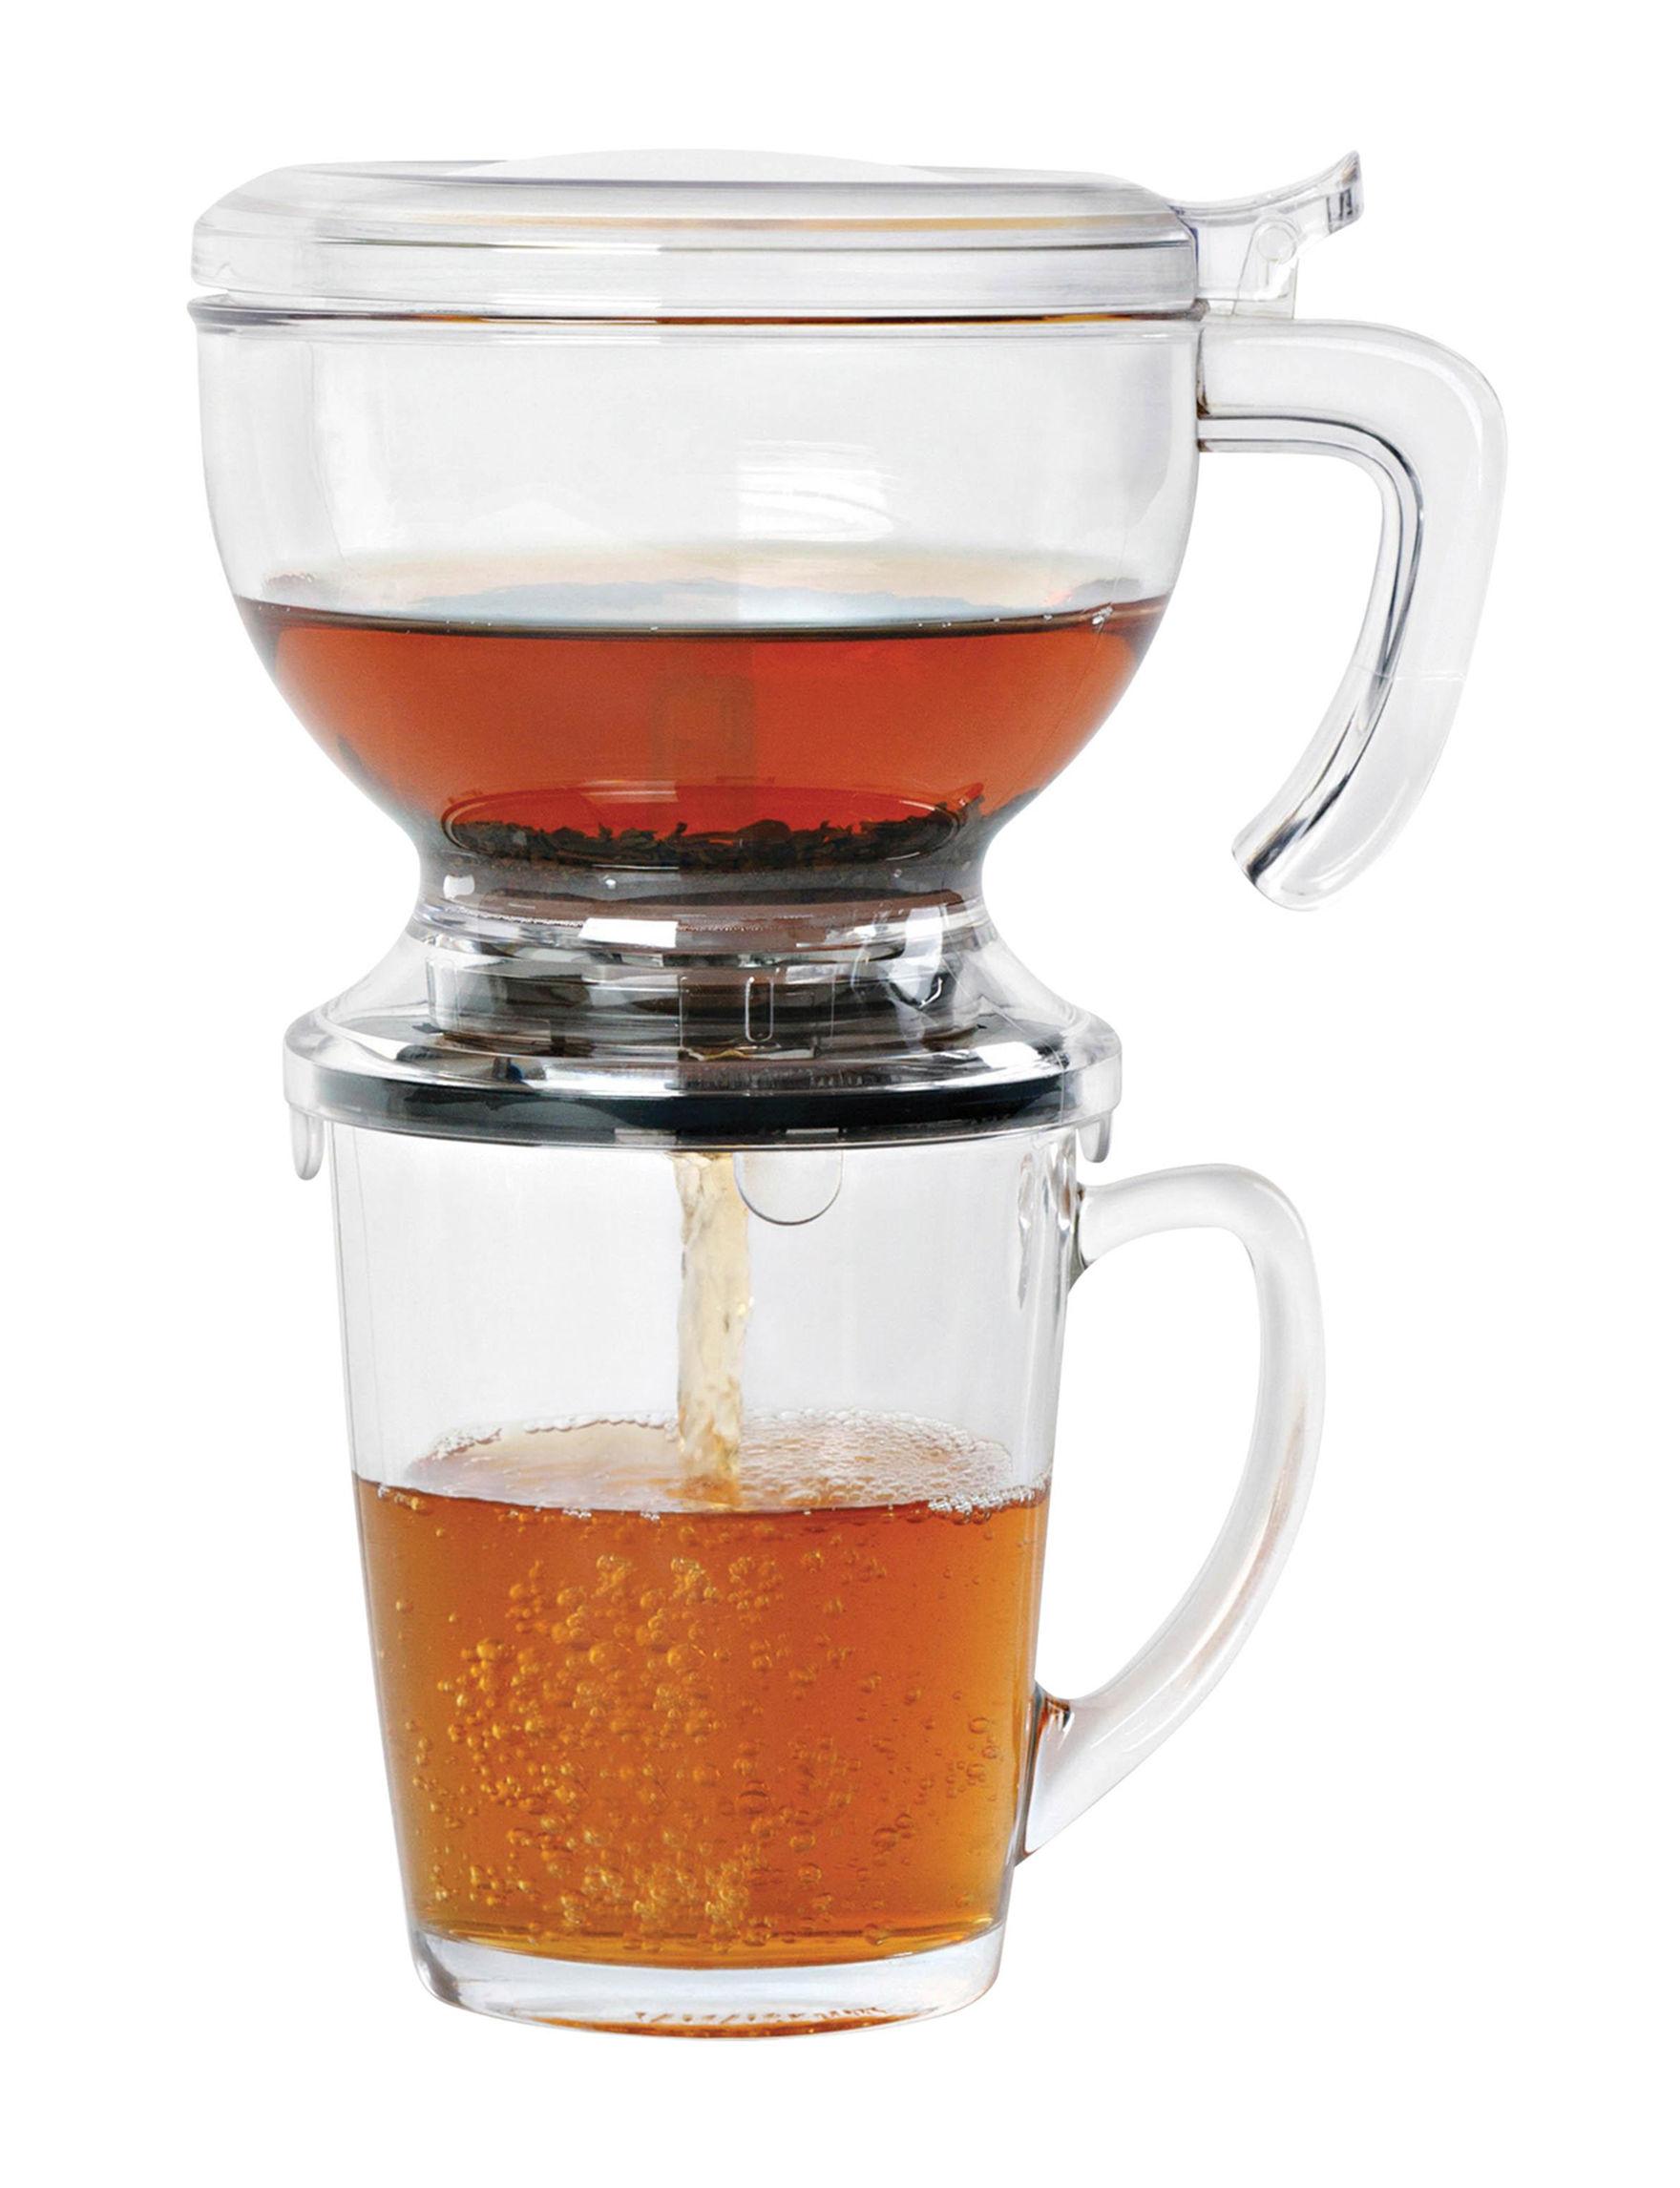 Honey-Can-Do International Clear Coffee, Espresso & Tea Makers Teapots Kitchen Appliances